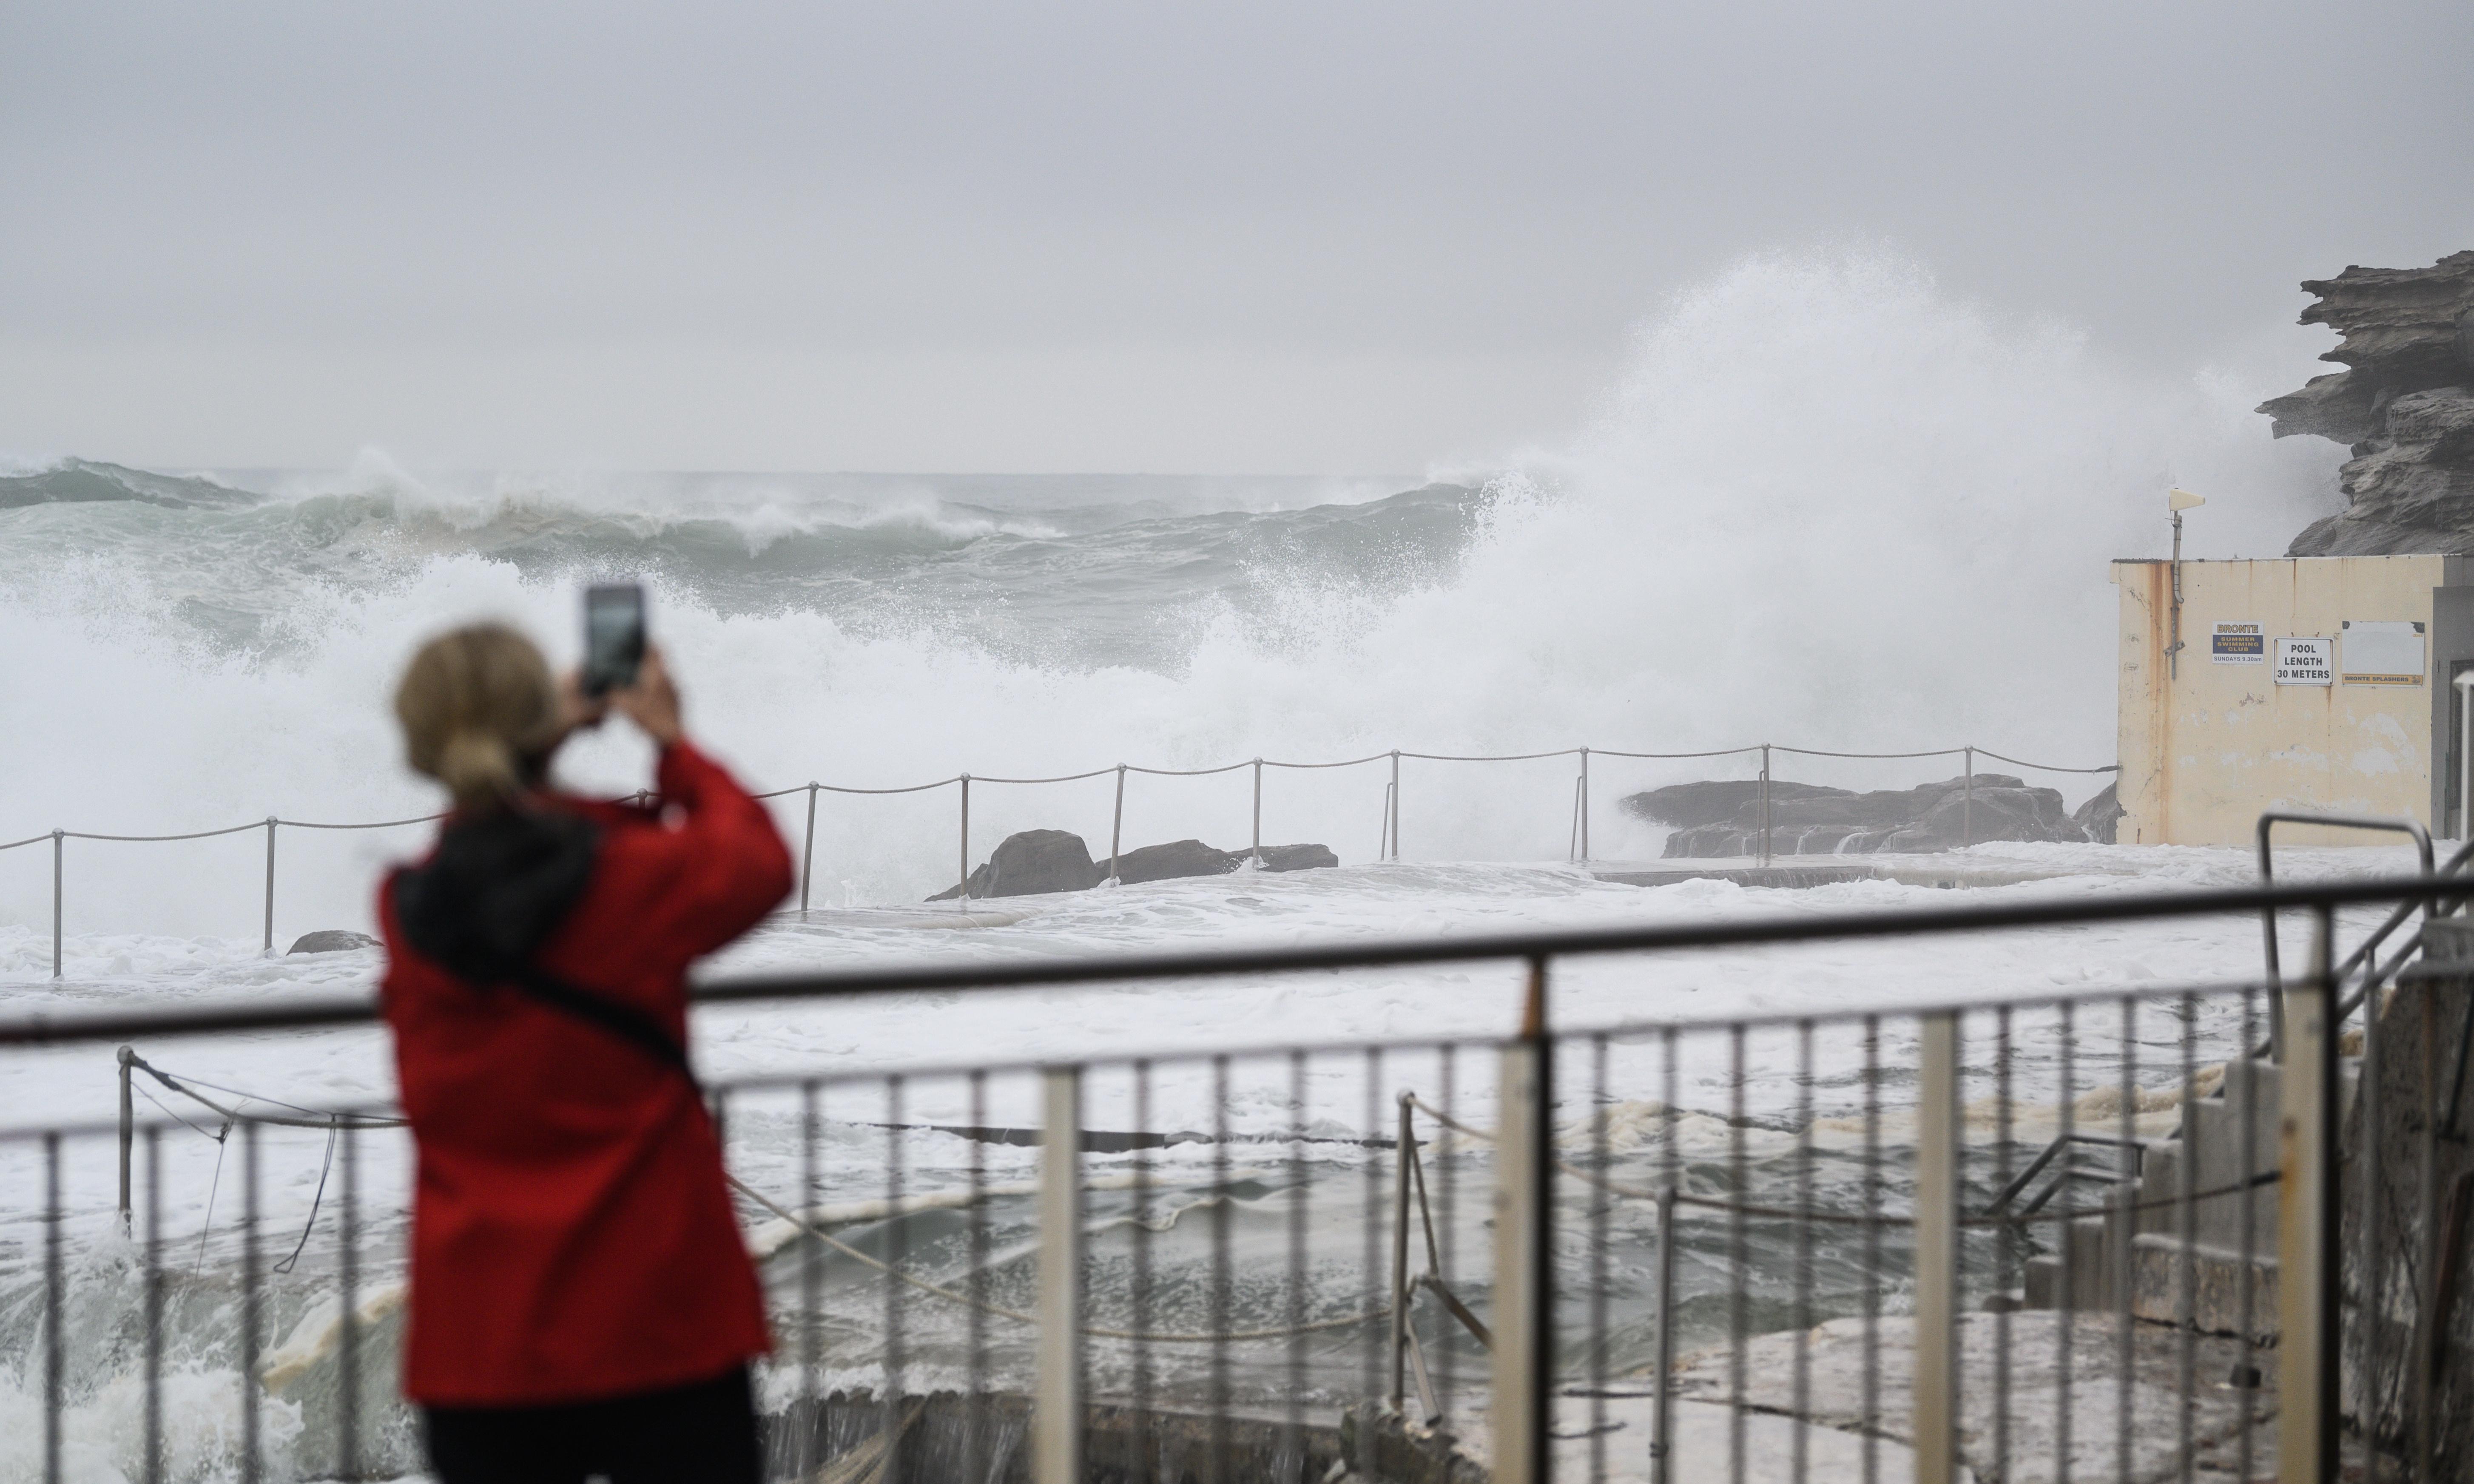 Storms to hit Sydney over weekend as Lord Howe Island endures ex-cyclone Uesi